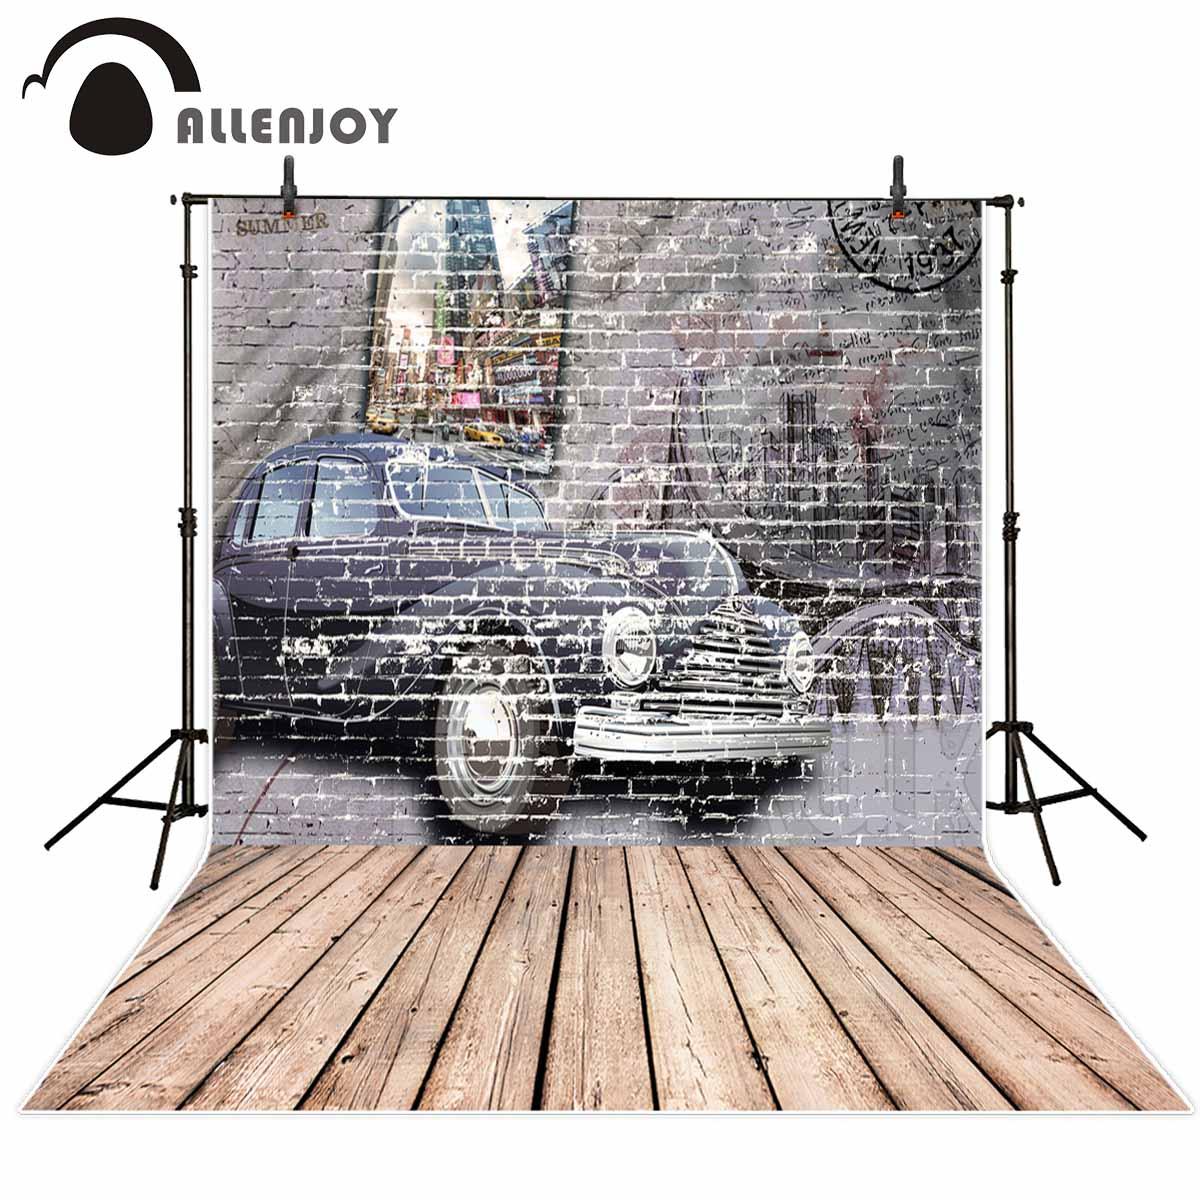 Allenjoy photo background bubble car Vintage Brick Wall Graffiti City Street Wooden Floor foto vinyl backdrops for photography